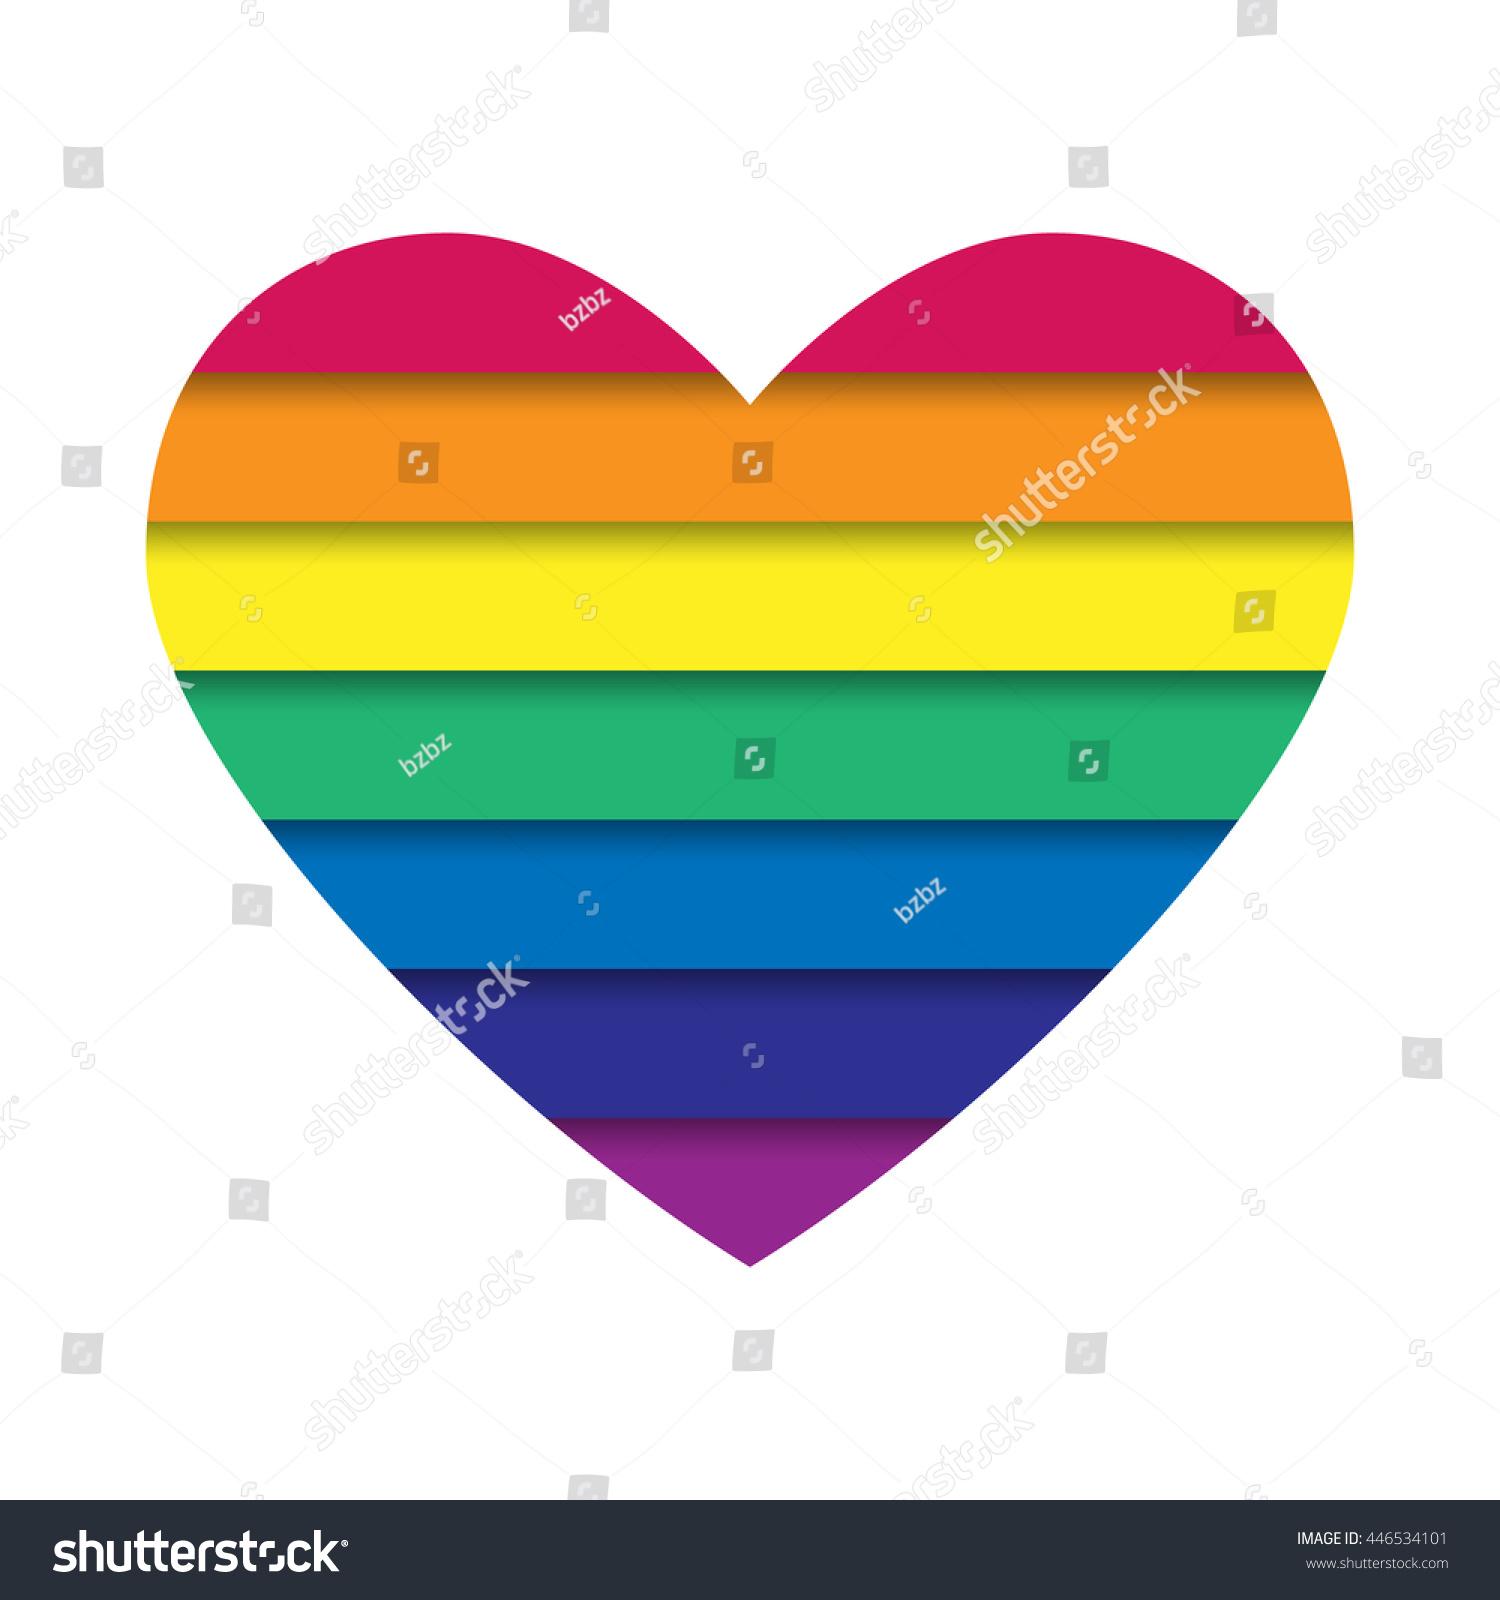 rainbow gay singles Meet rainbow city single gay men online interested in meeting new people to date zoosk is used by millions of singles around the world to meet new people to date.